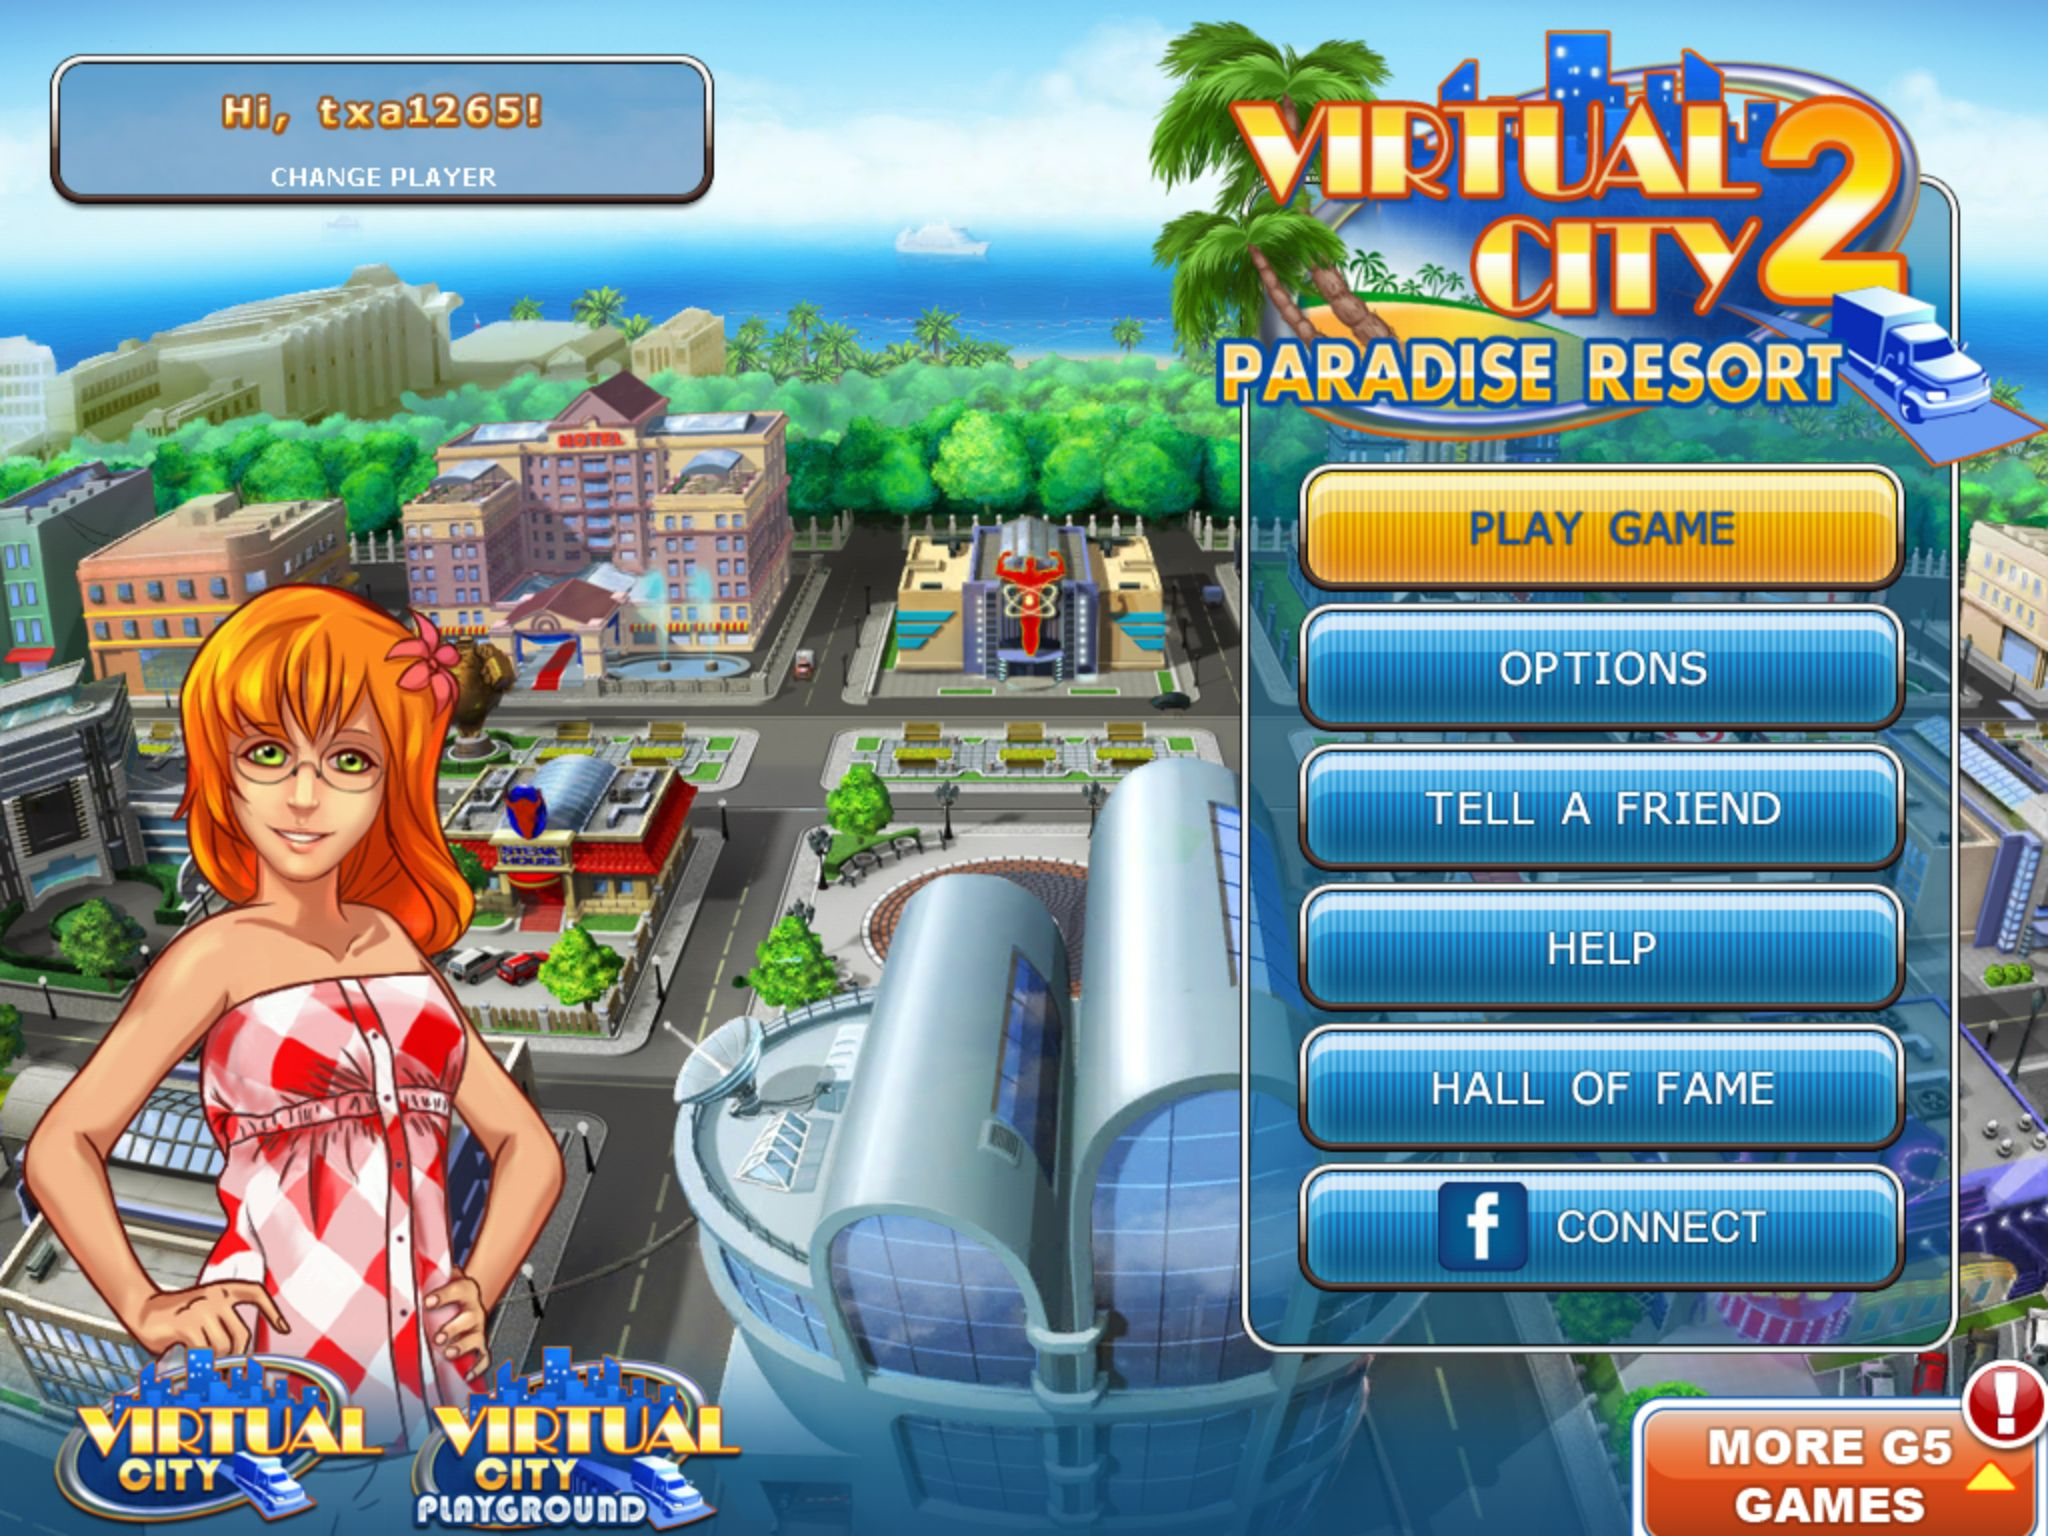 Virtual City 24